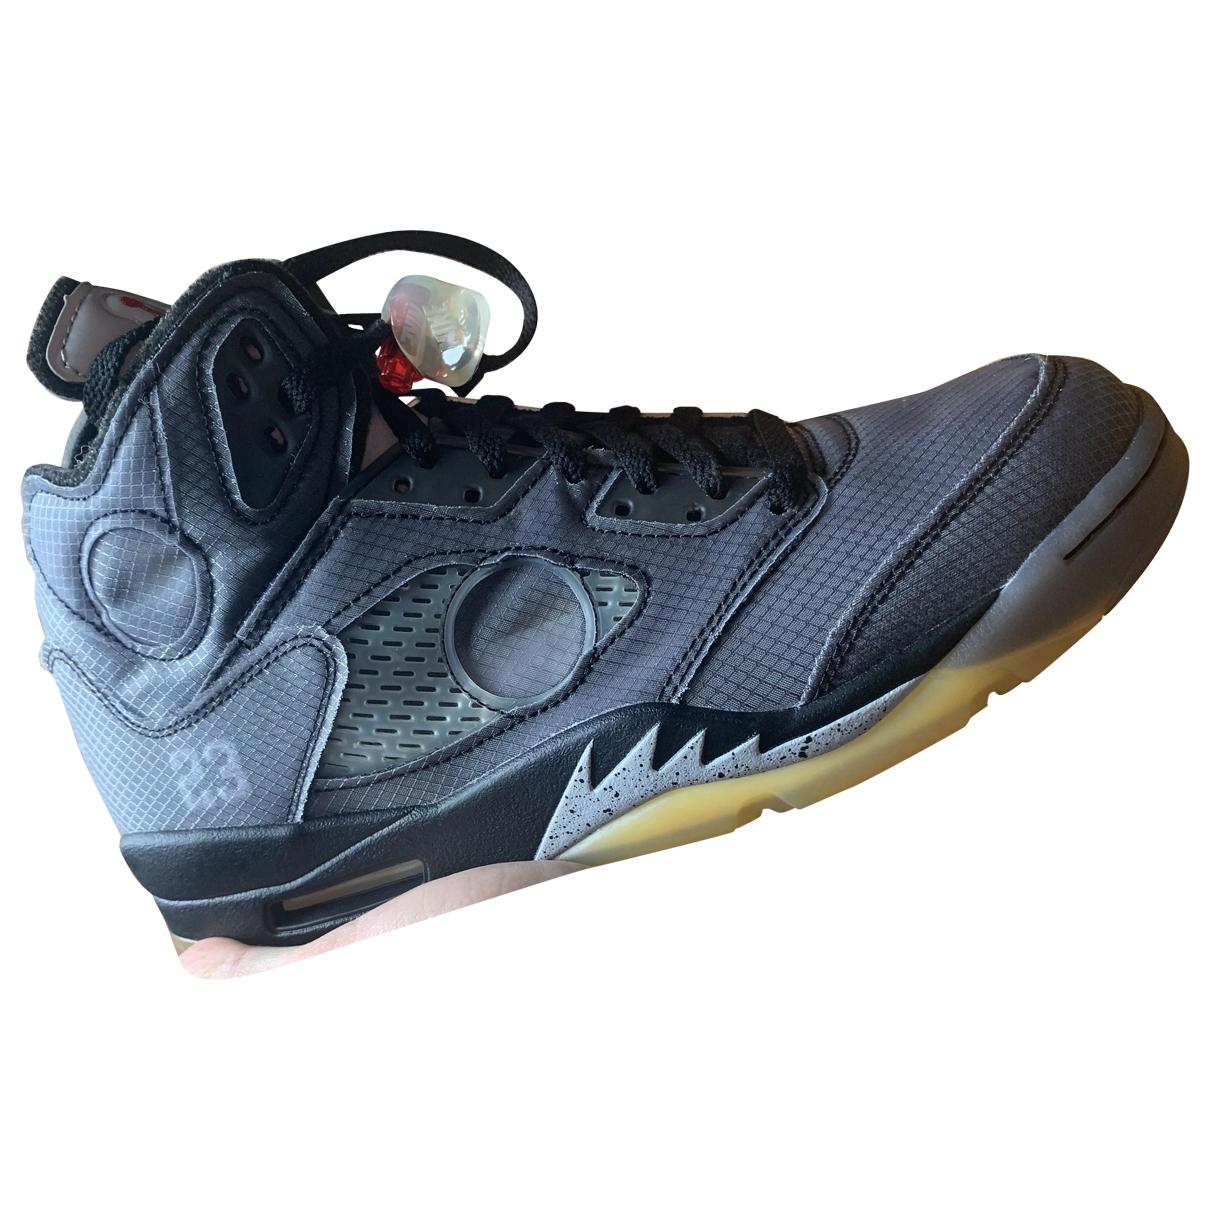 Nike X Off-white Jordan 5 Sneakers in  Grau Leinen